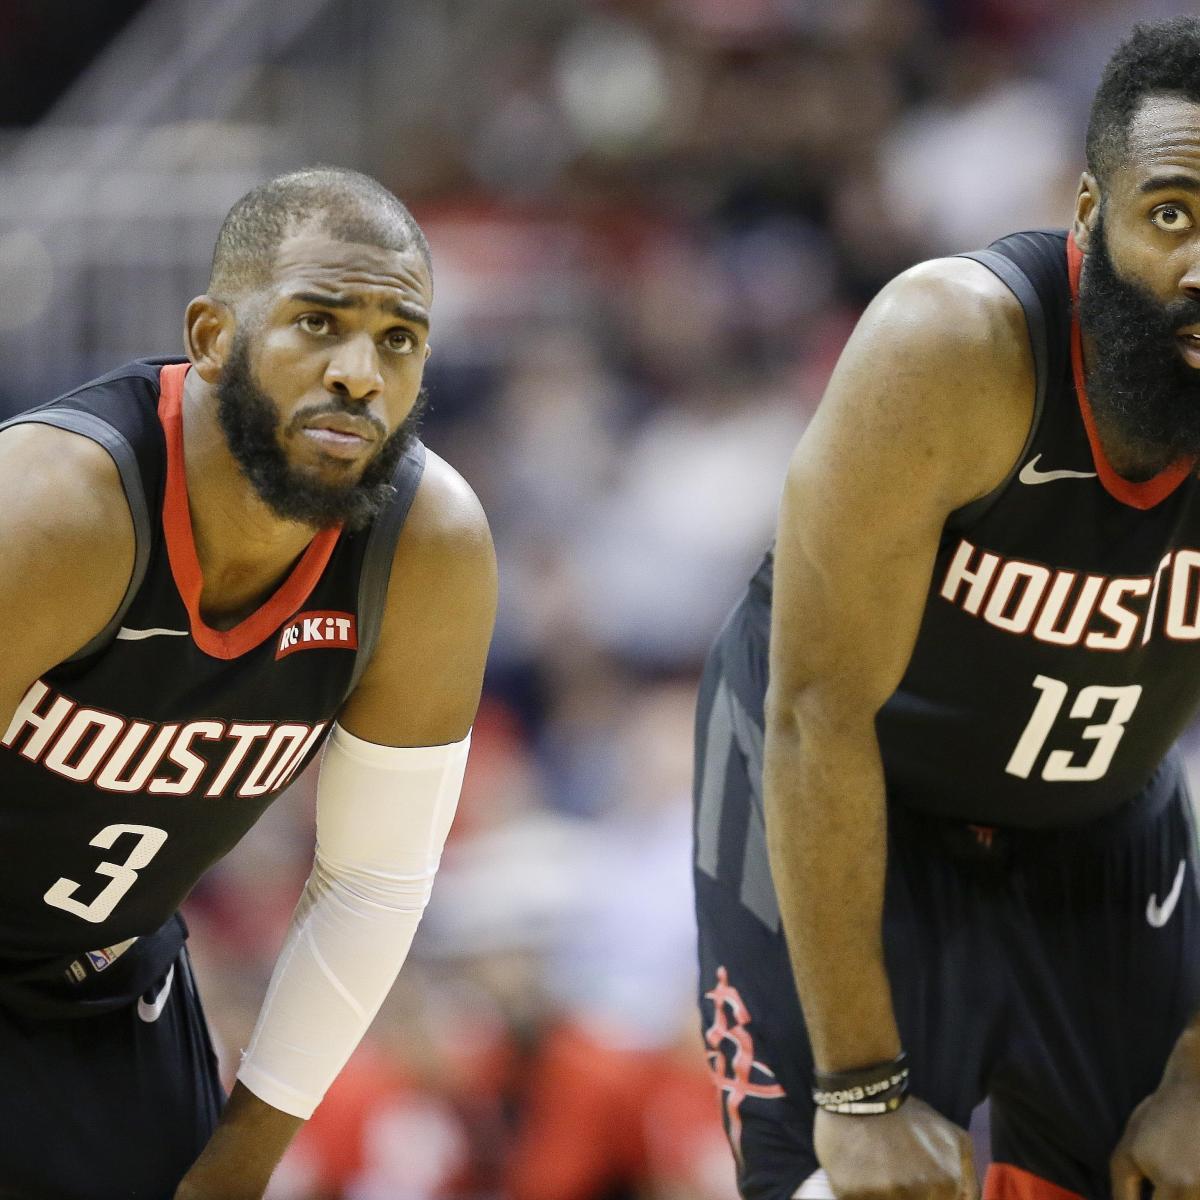 Houston Rockets News Trade: Rockets GM Daryl Morey Says Team Will Keep 'Key People